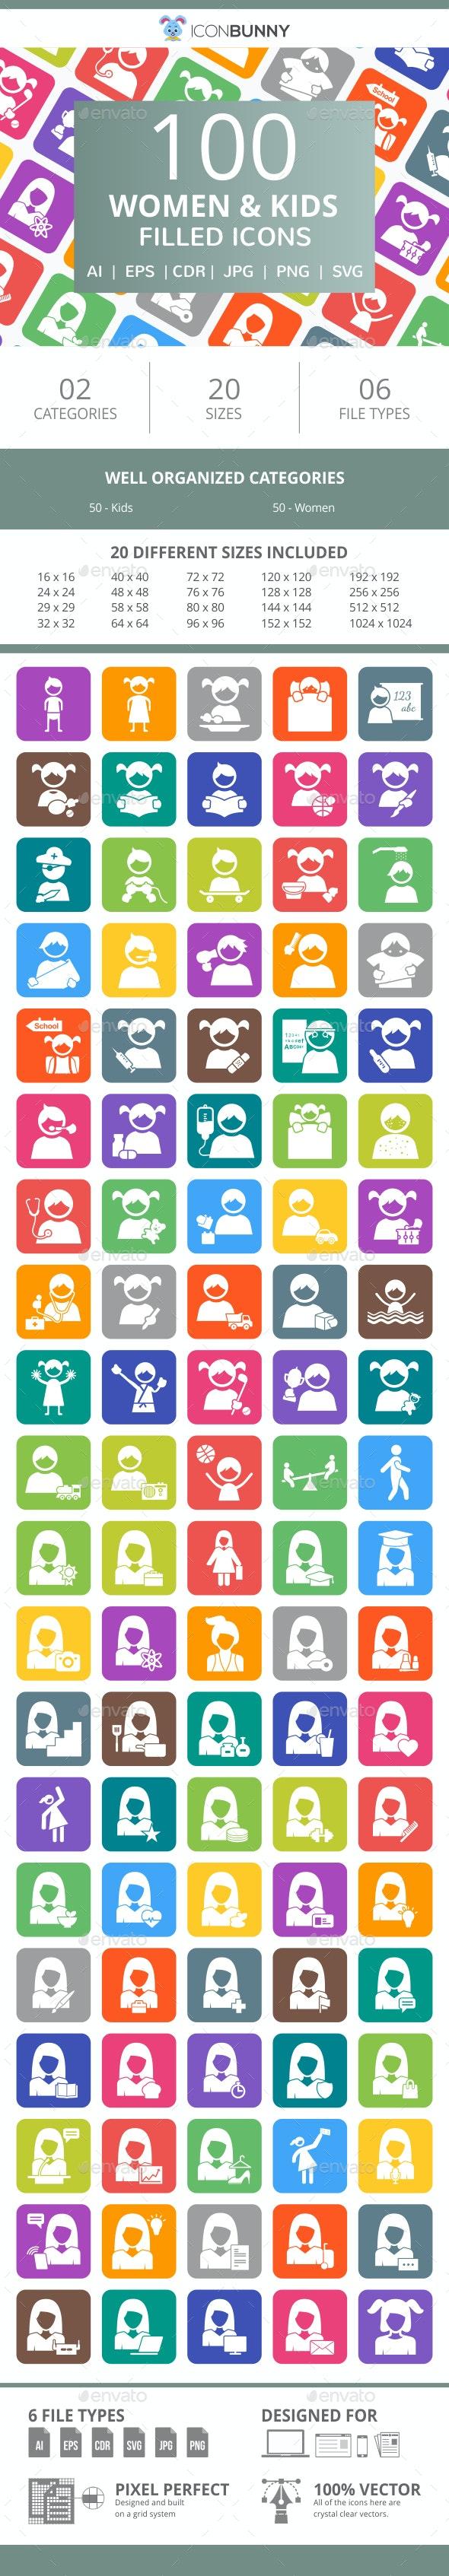 100 Women & Kids Filled Round Corner Icons - Icons